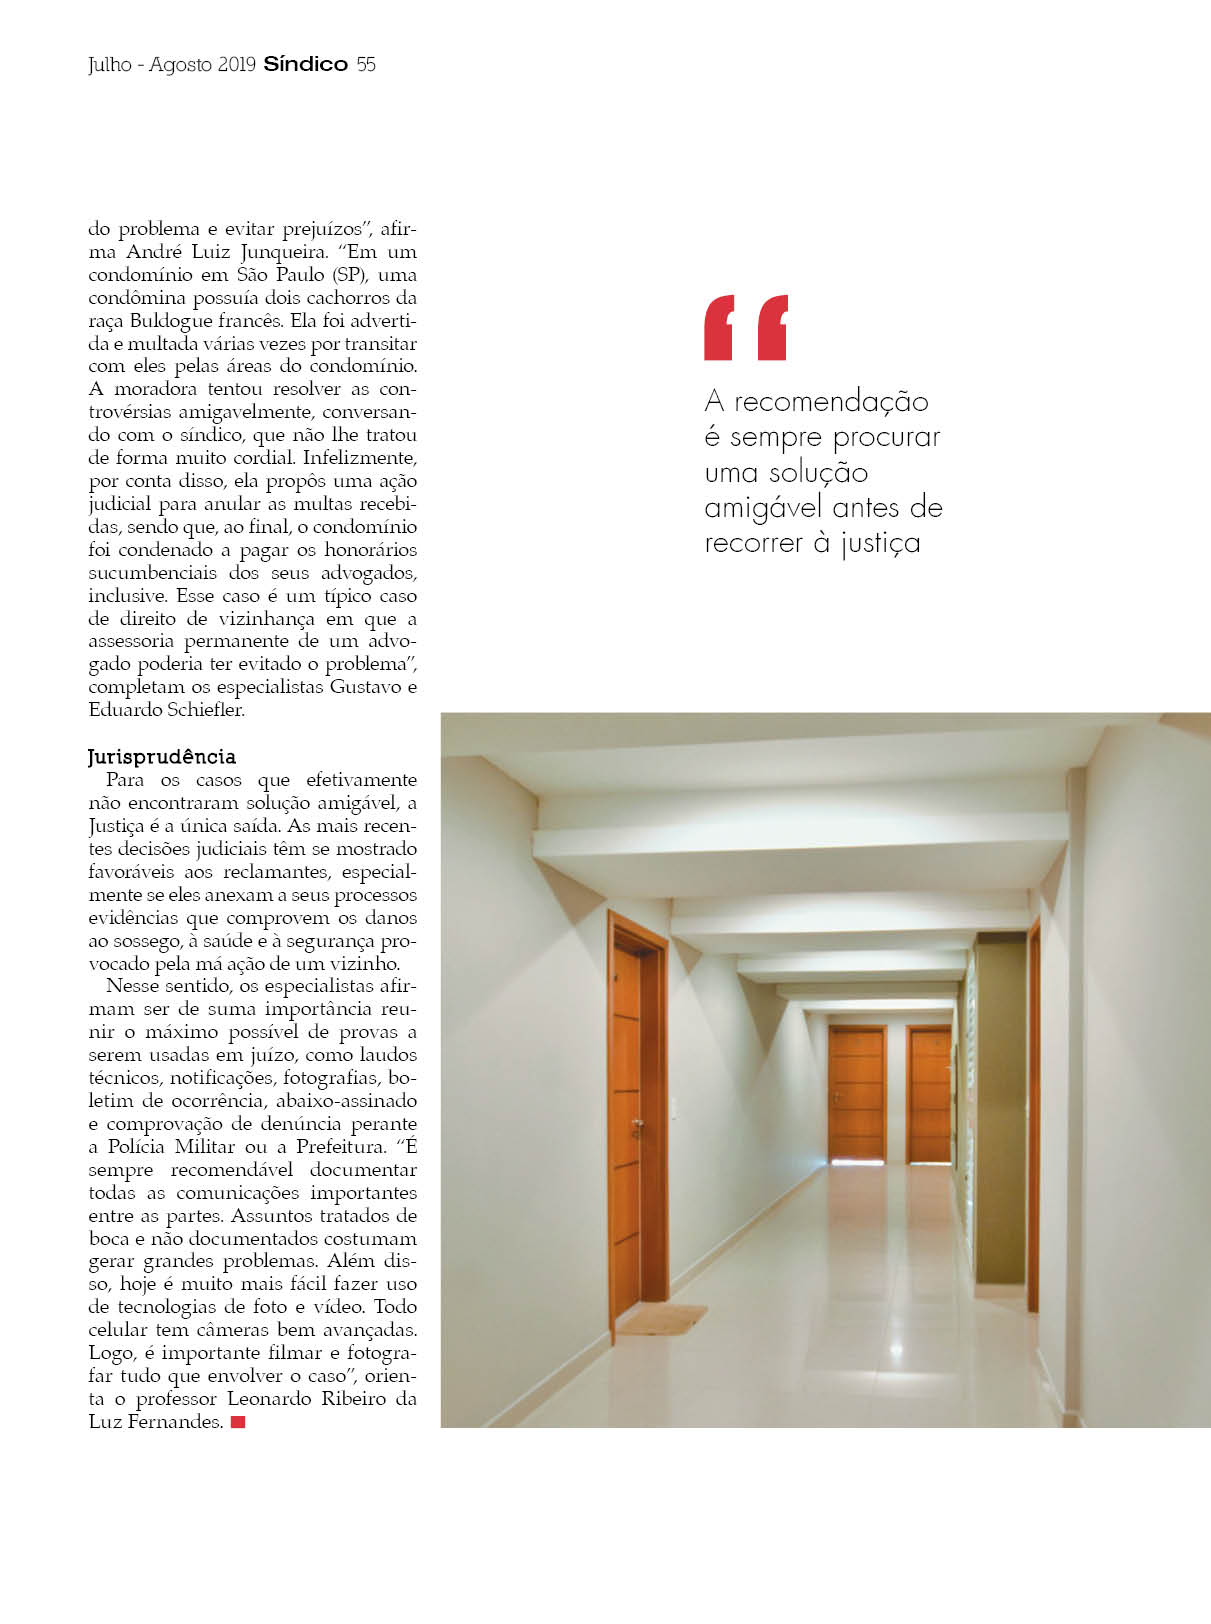 Revista Síndico_ed 24553